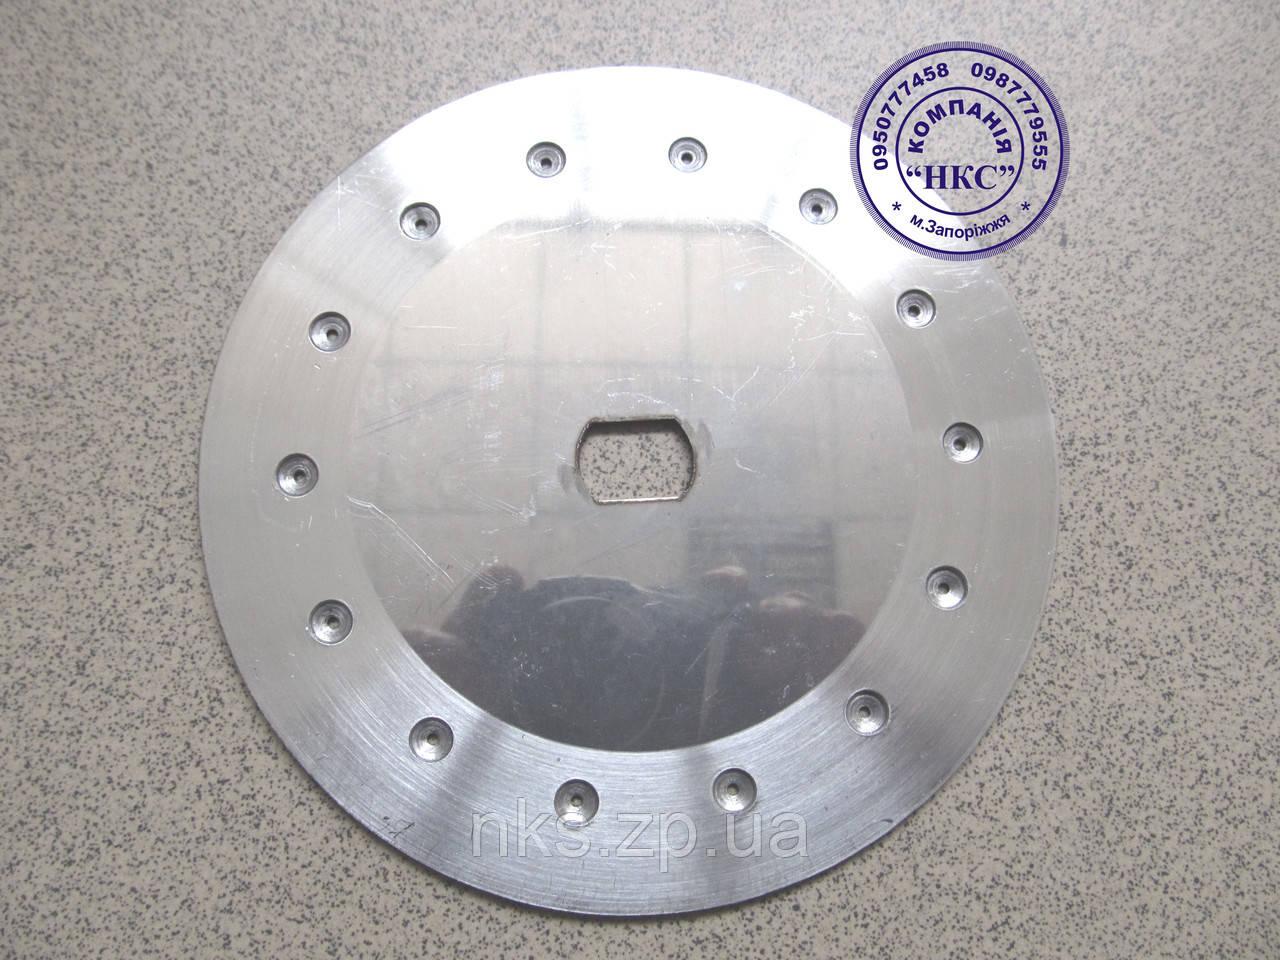 Диск высевающий 2,2х14х2,5 нержавеющая сталь СУПН-8.